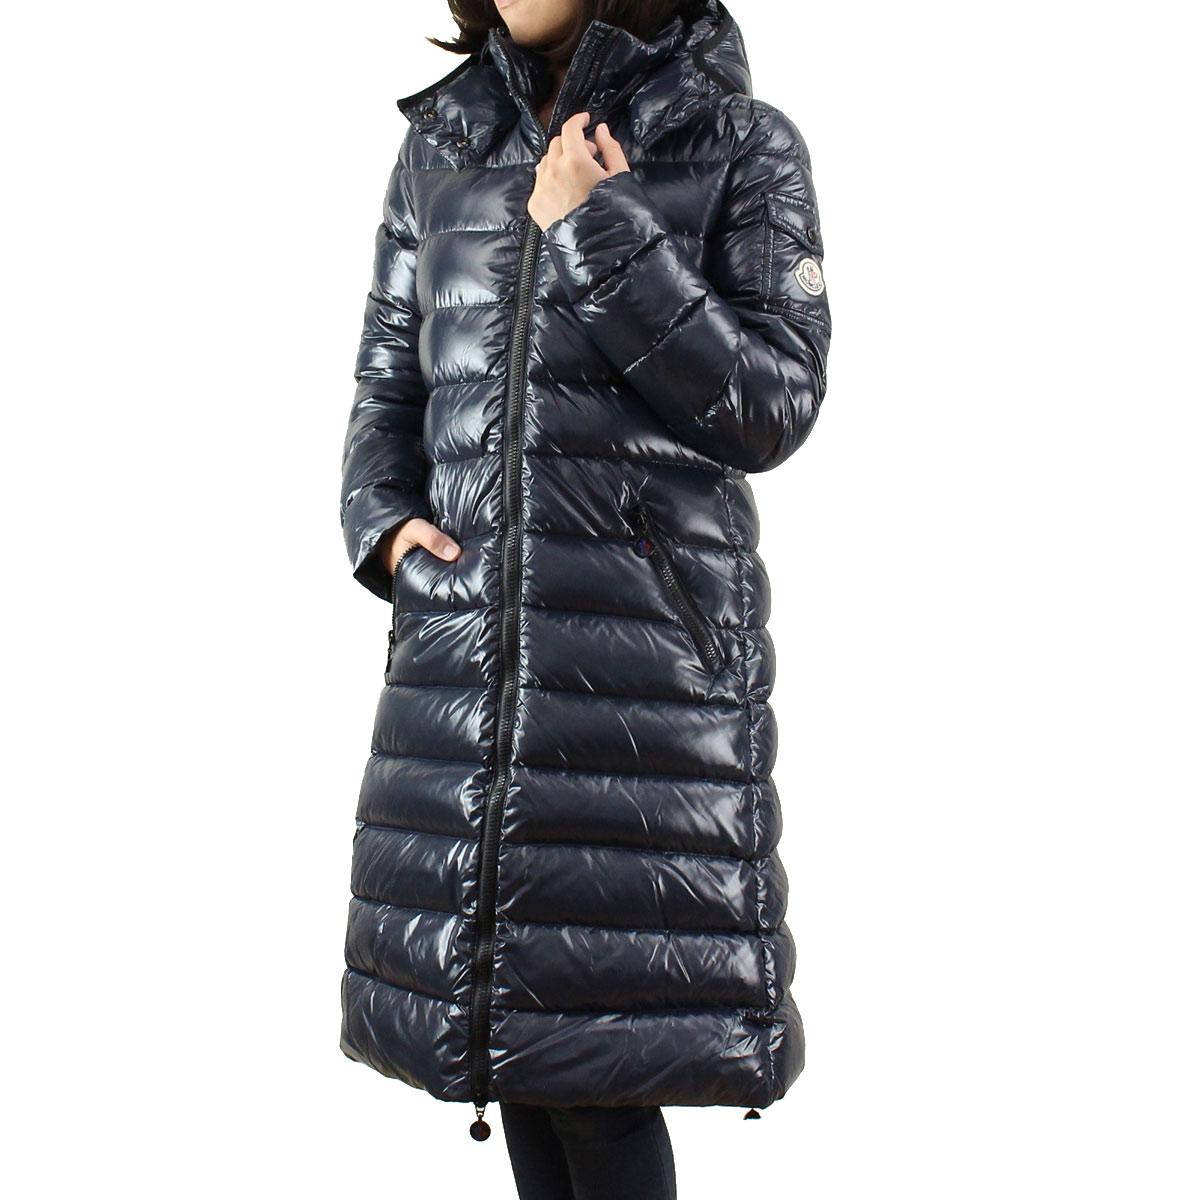 MONCLER (MONCLER) [MOKA] women's down coat MOKA 4931105 15 - 68950 - 742 blue( taxfree/send by EMS/authentic/A brand new item )